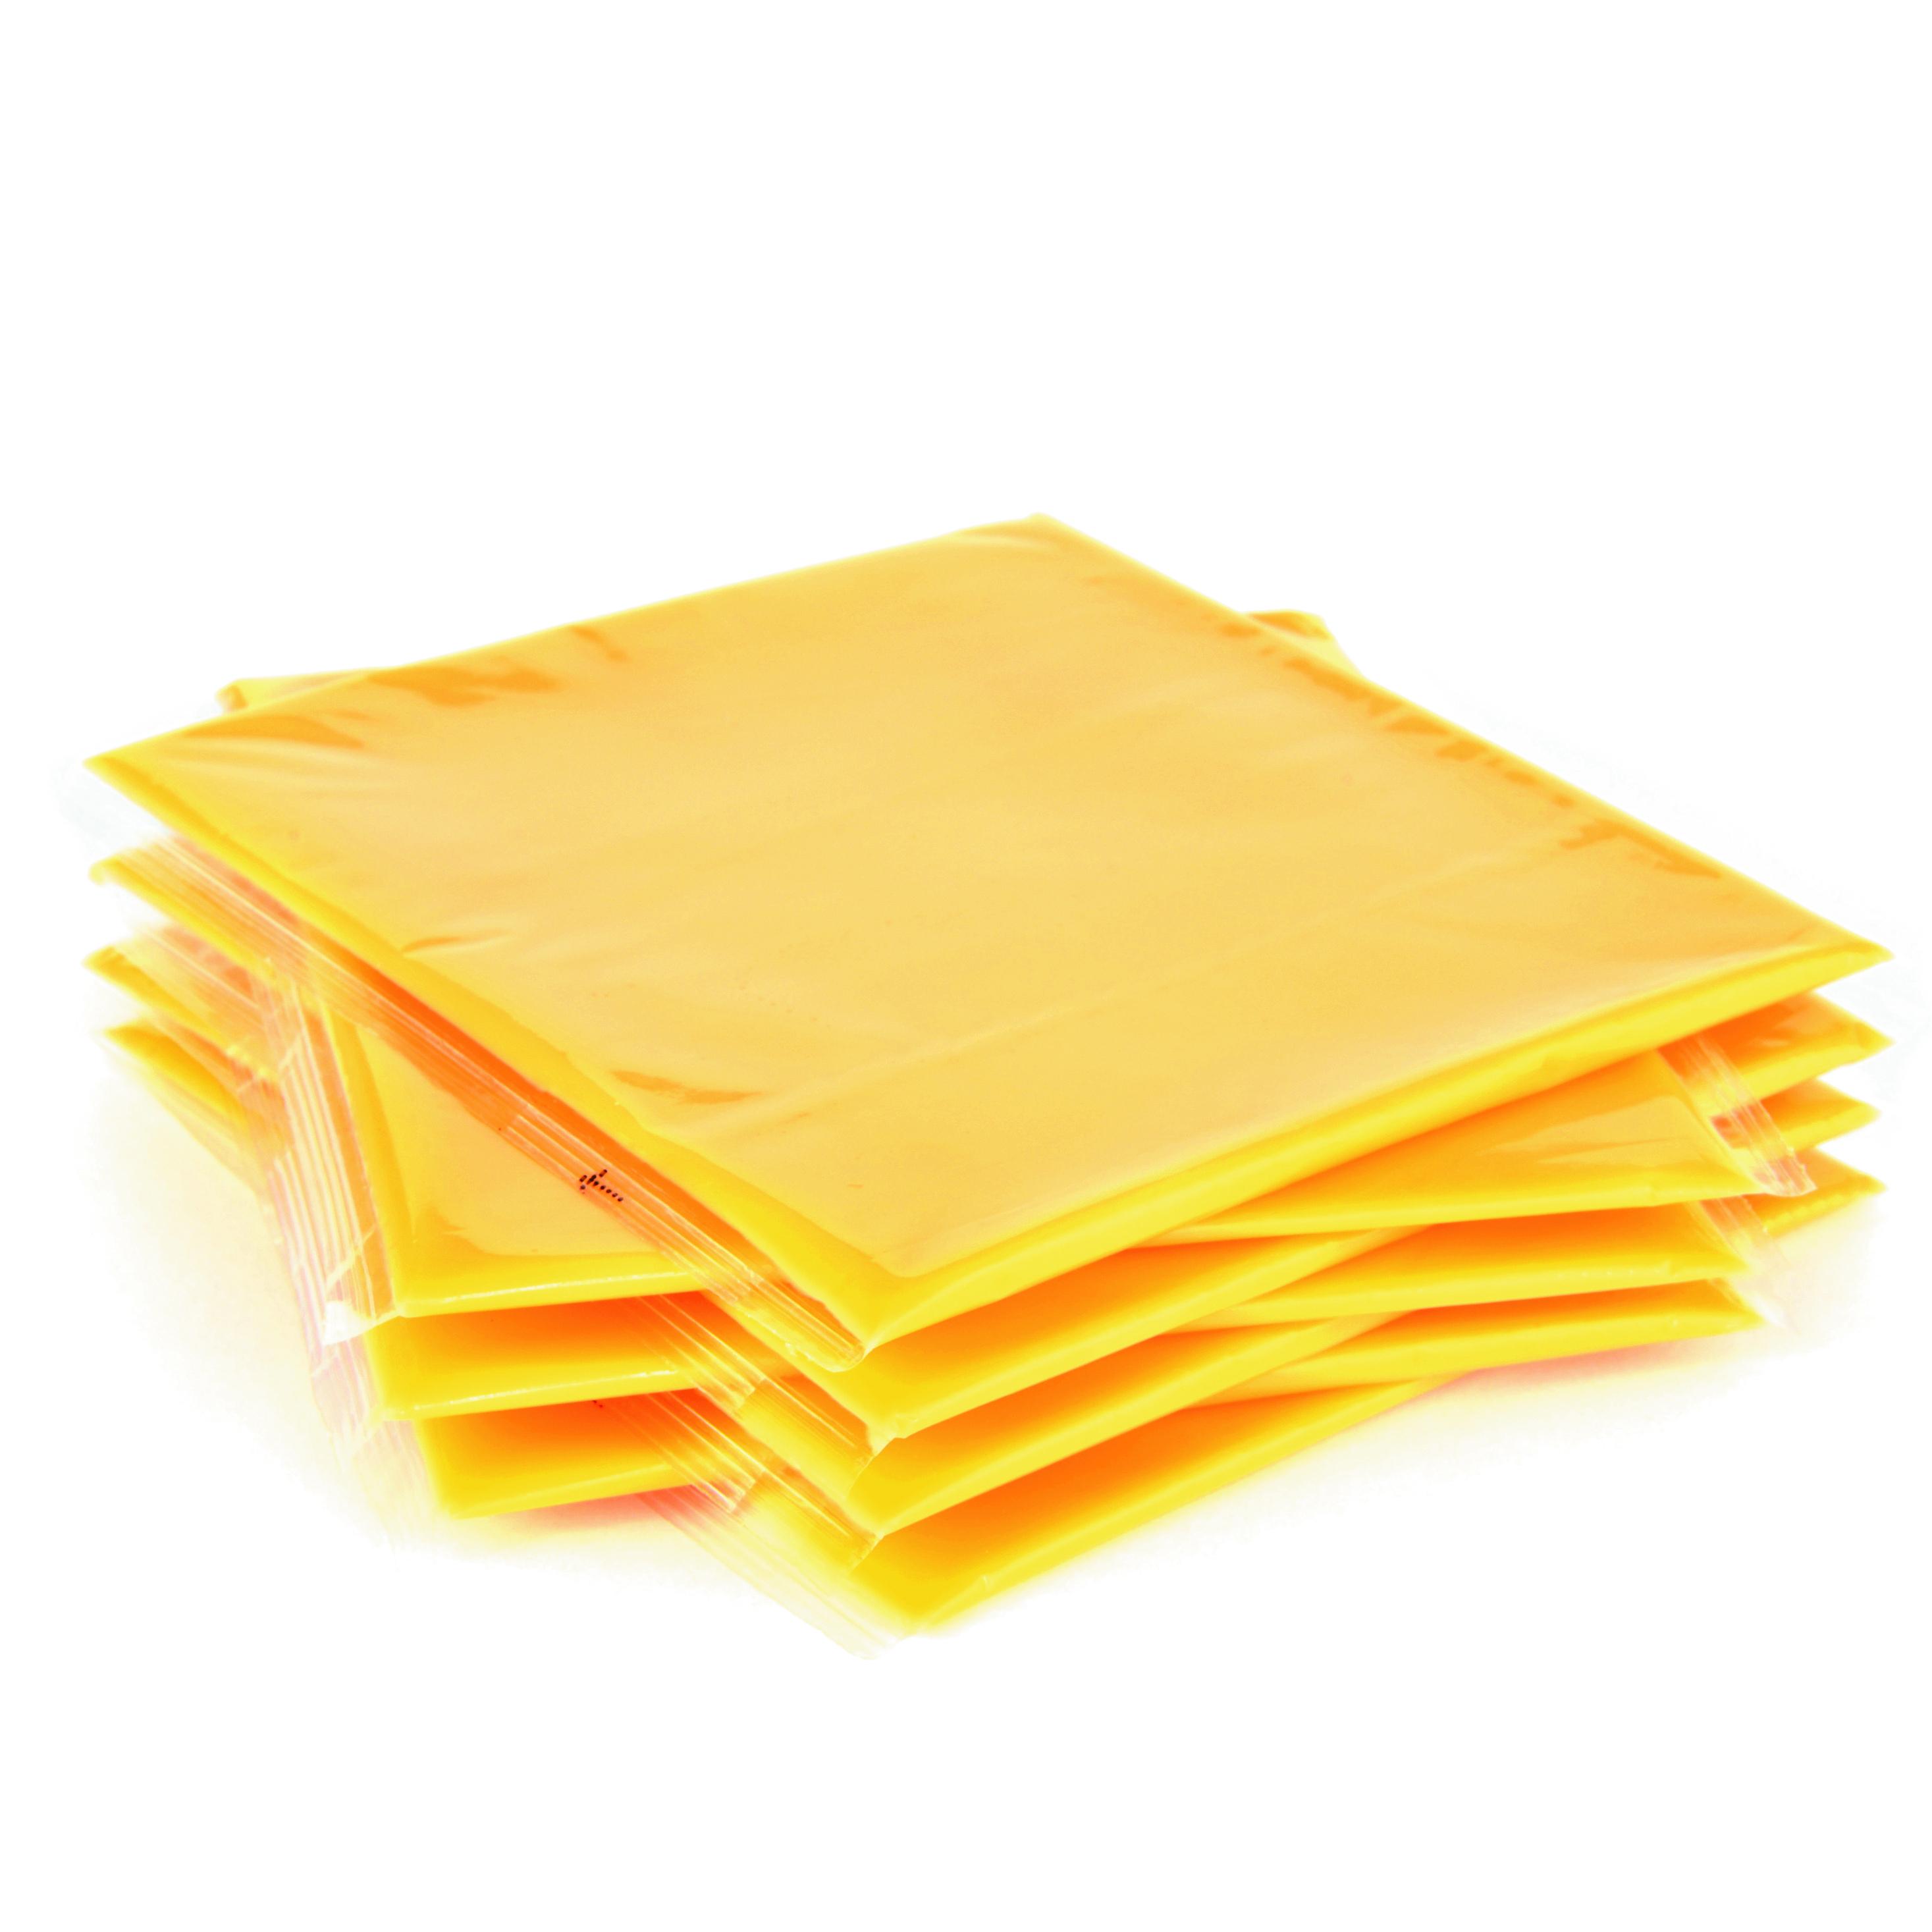 1 Slice of Cheese.